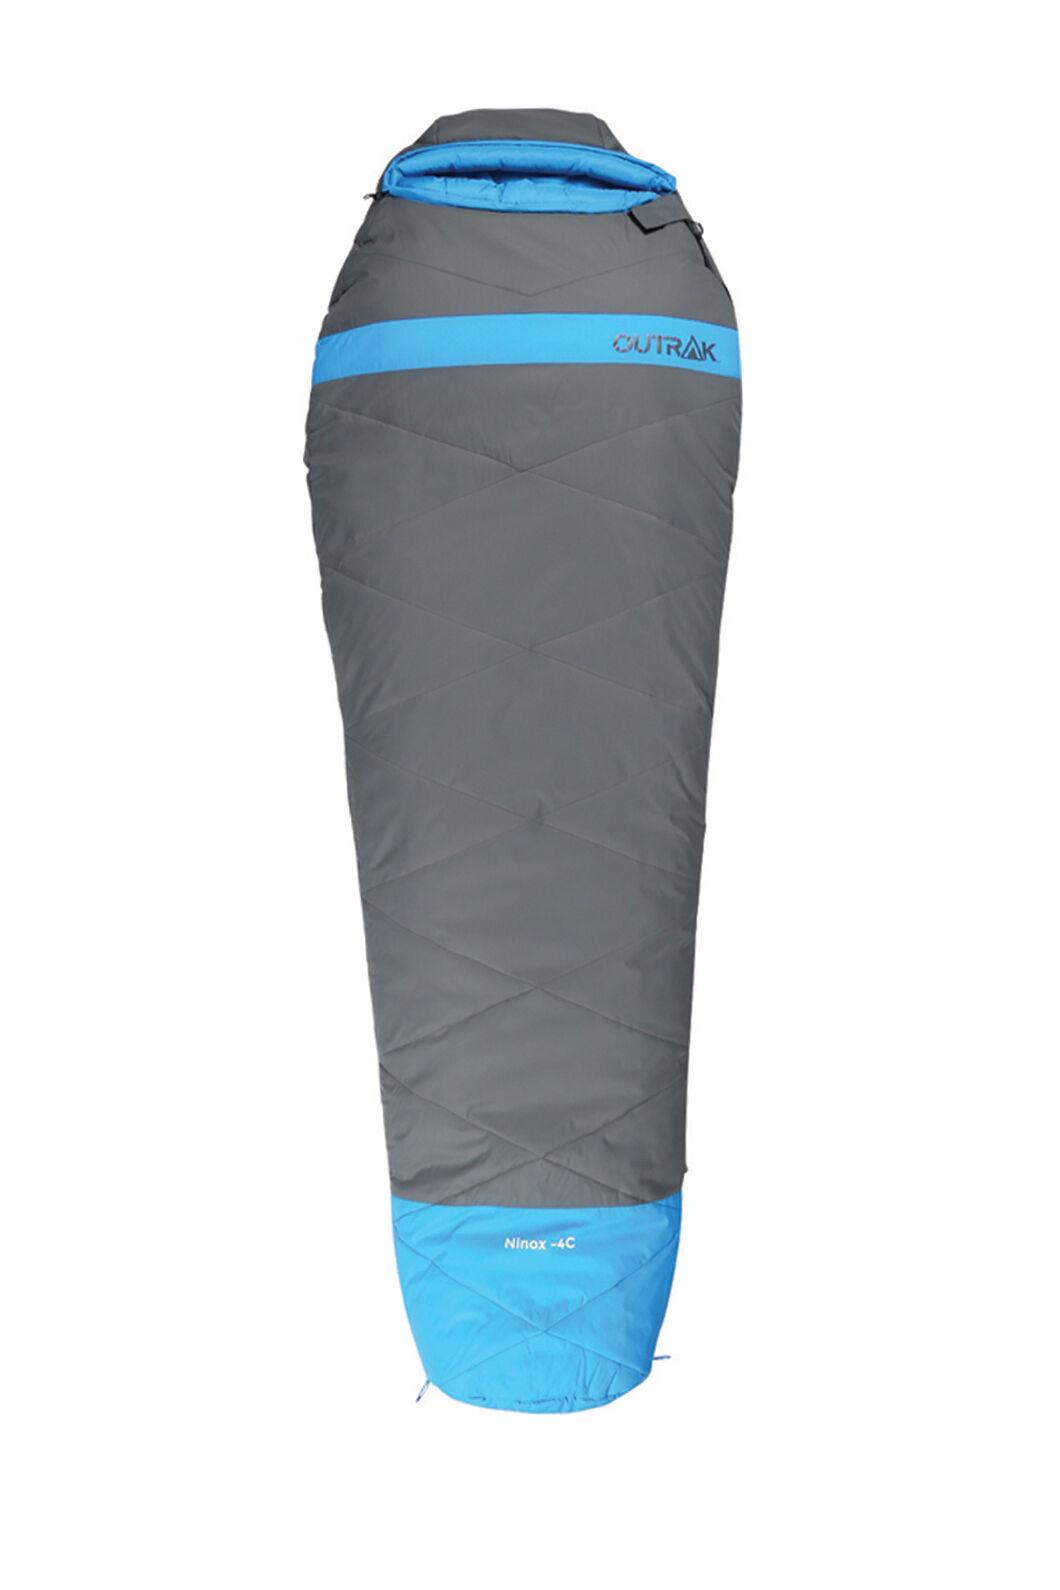 Outrak Ninox Sleeping Bag -4, None, hi-res